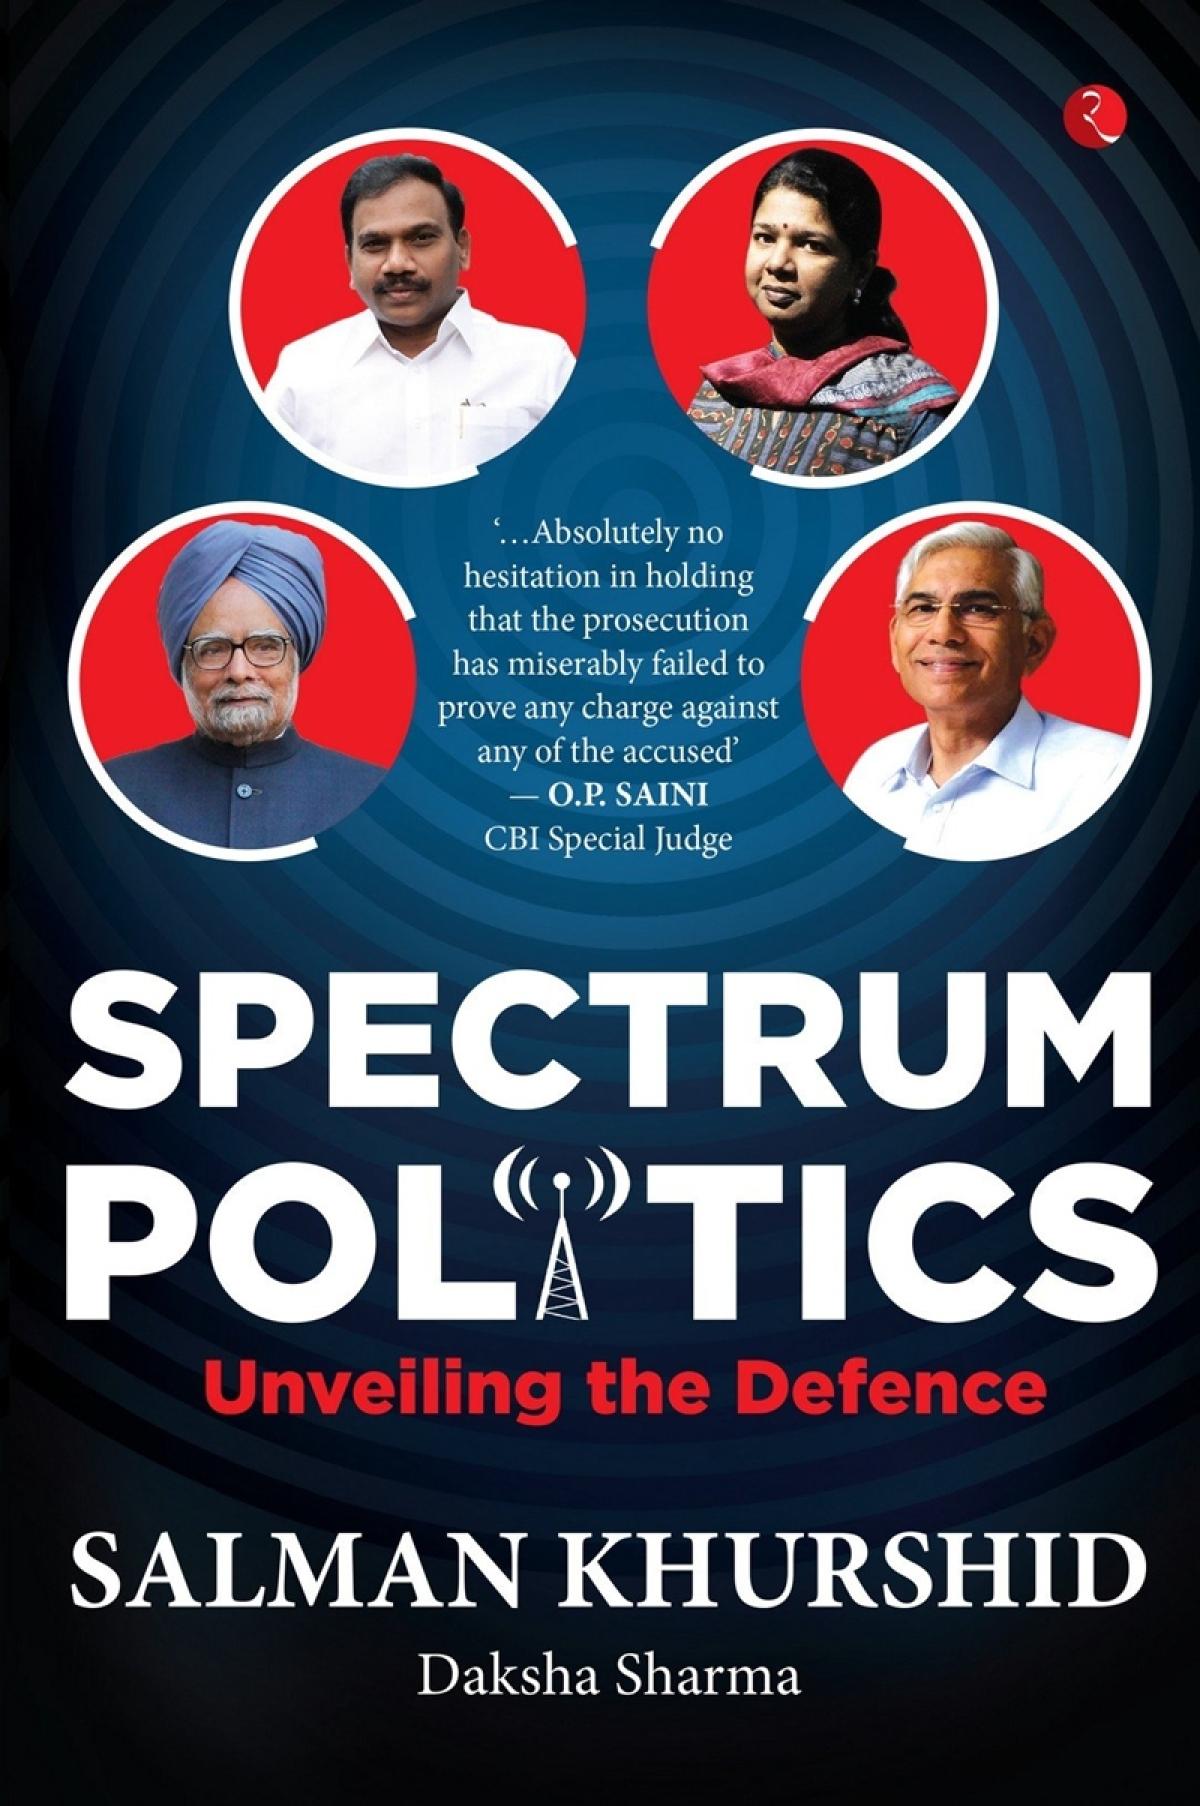 Spectrum Politics: Unveiling the Defense by Salman Khurshid and Daksha Sharma-Review